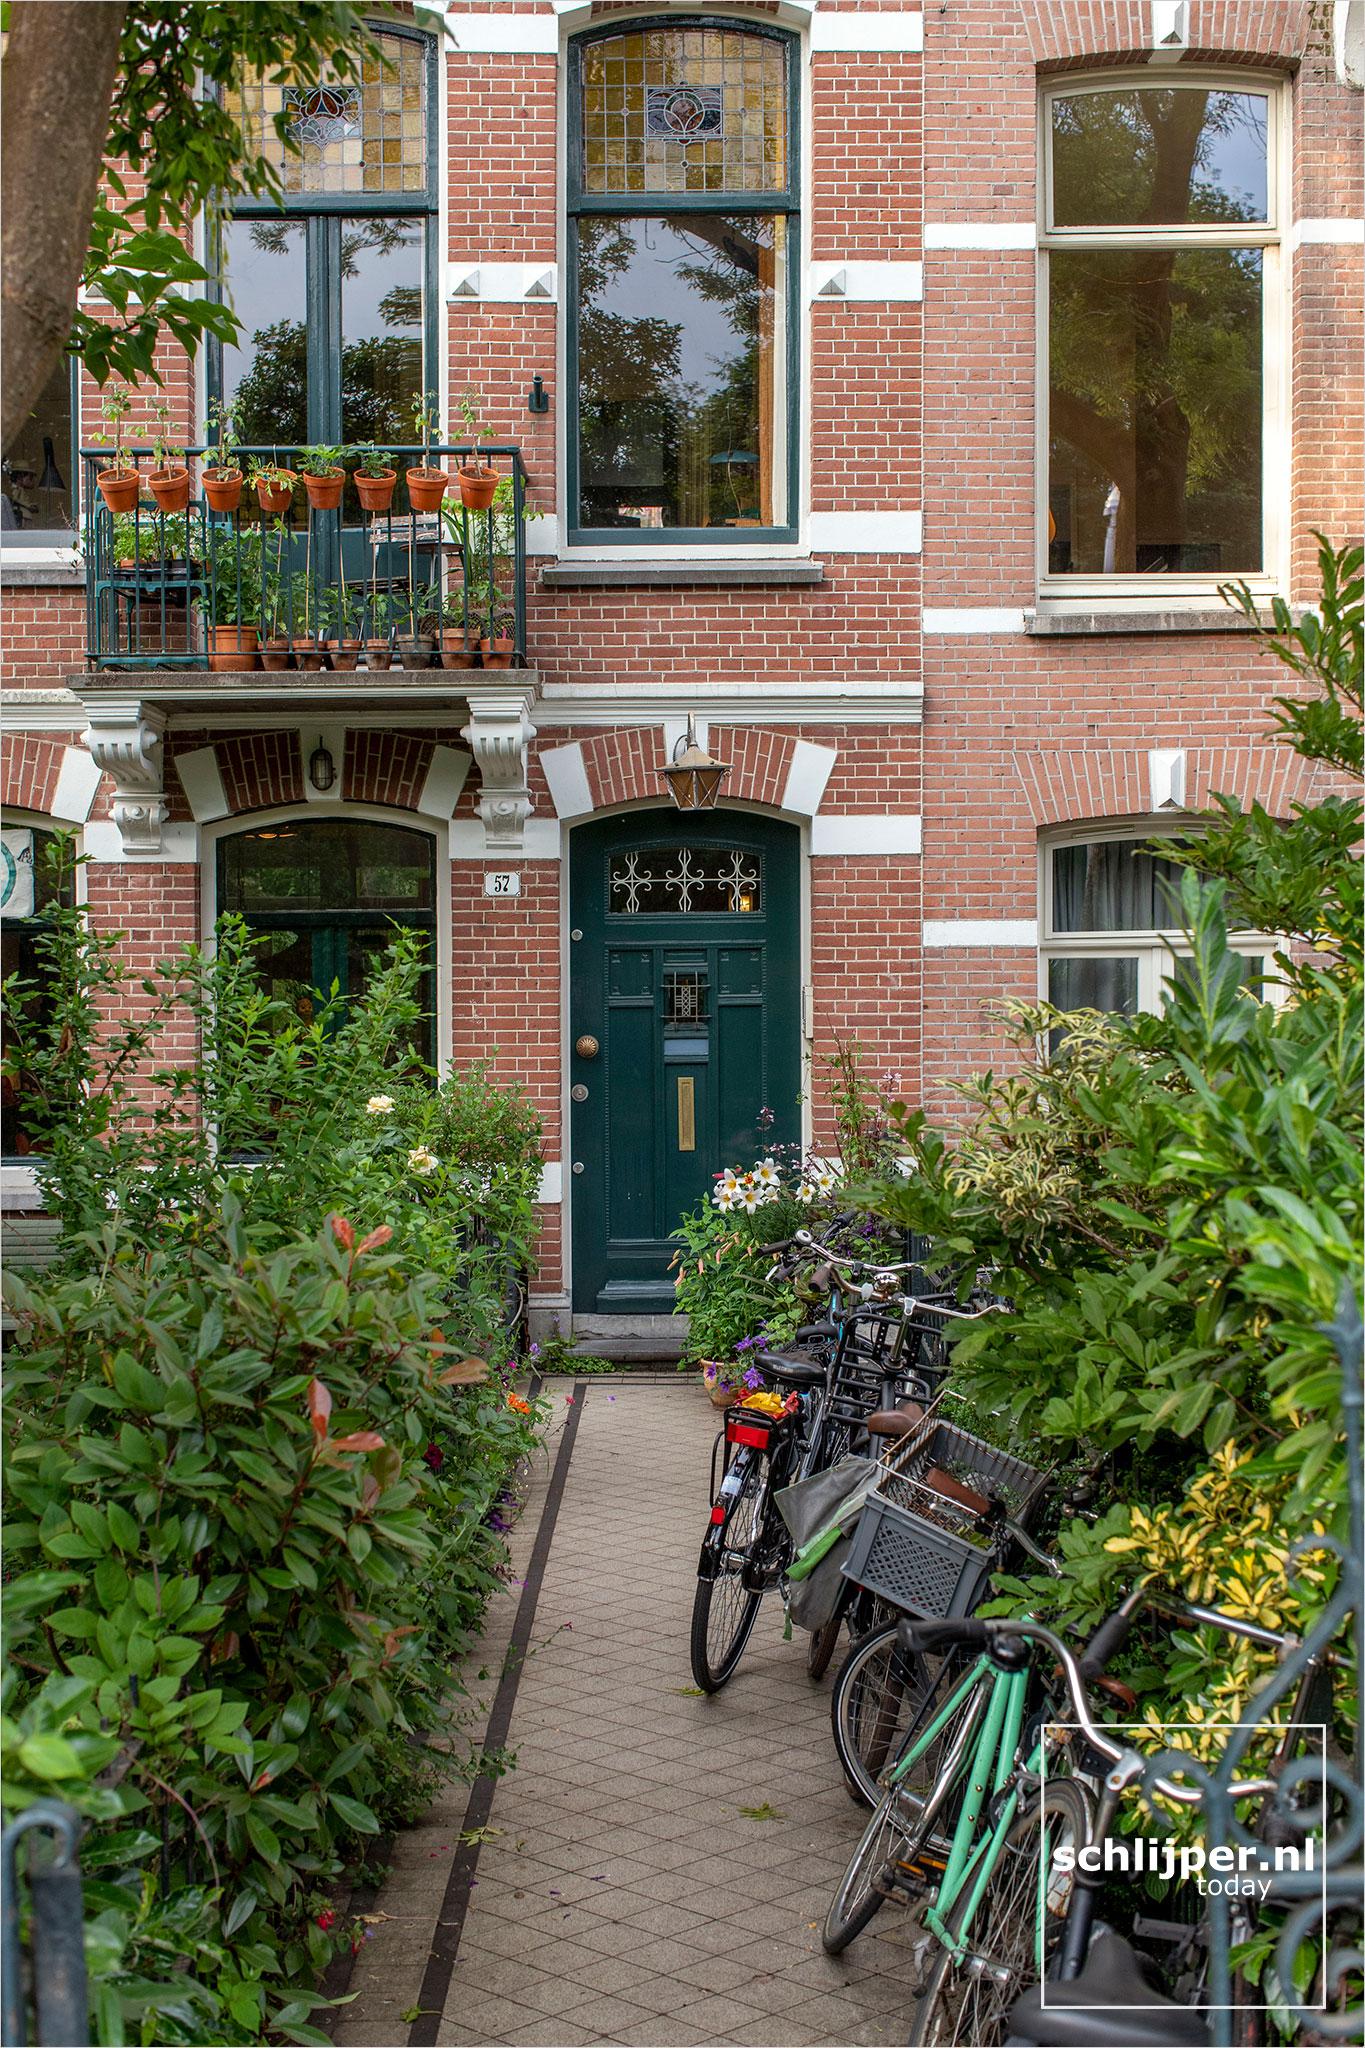 Nederland, Amsterdam, 17 juni 2020